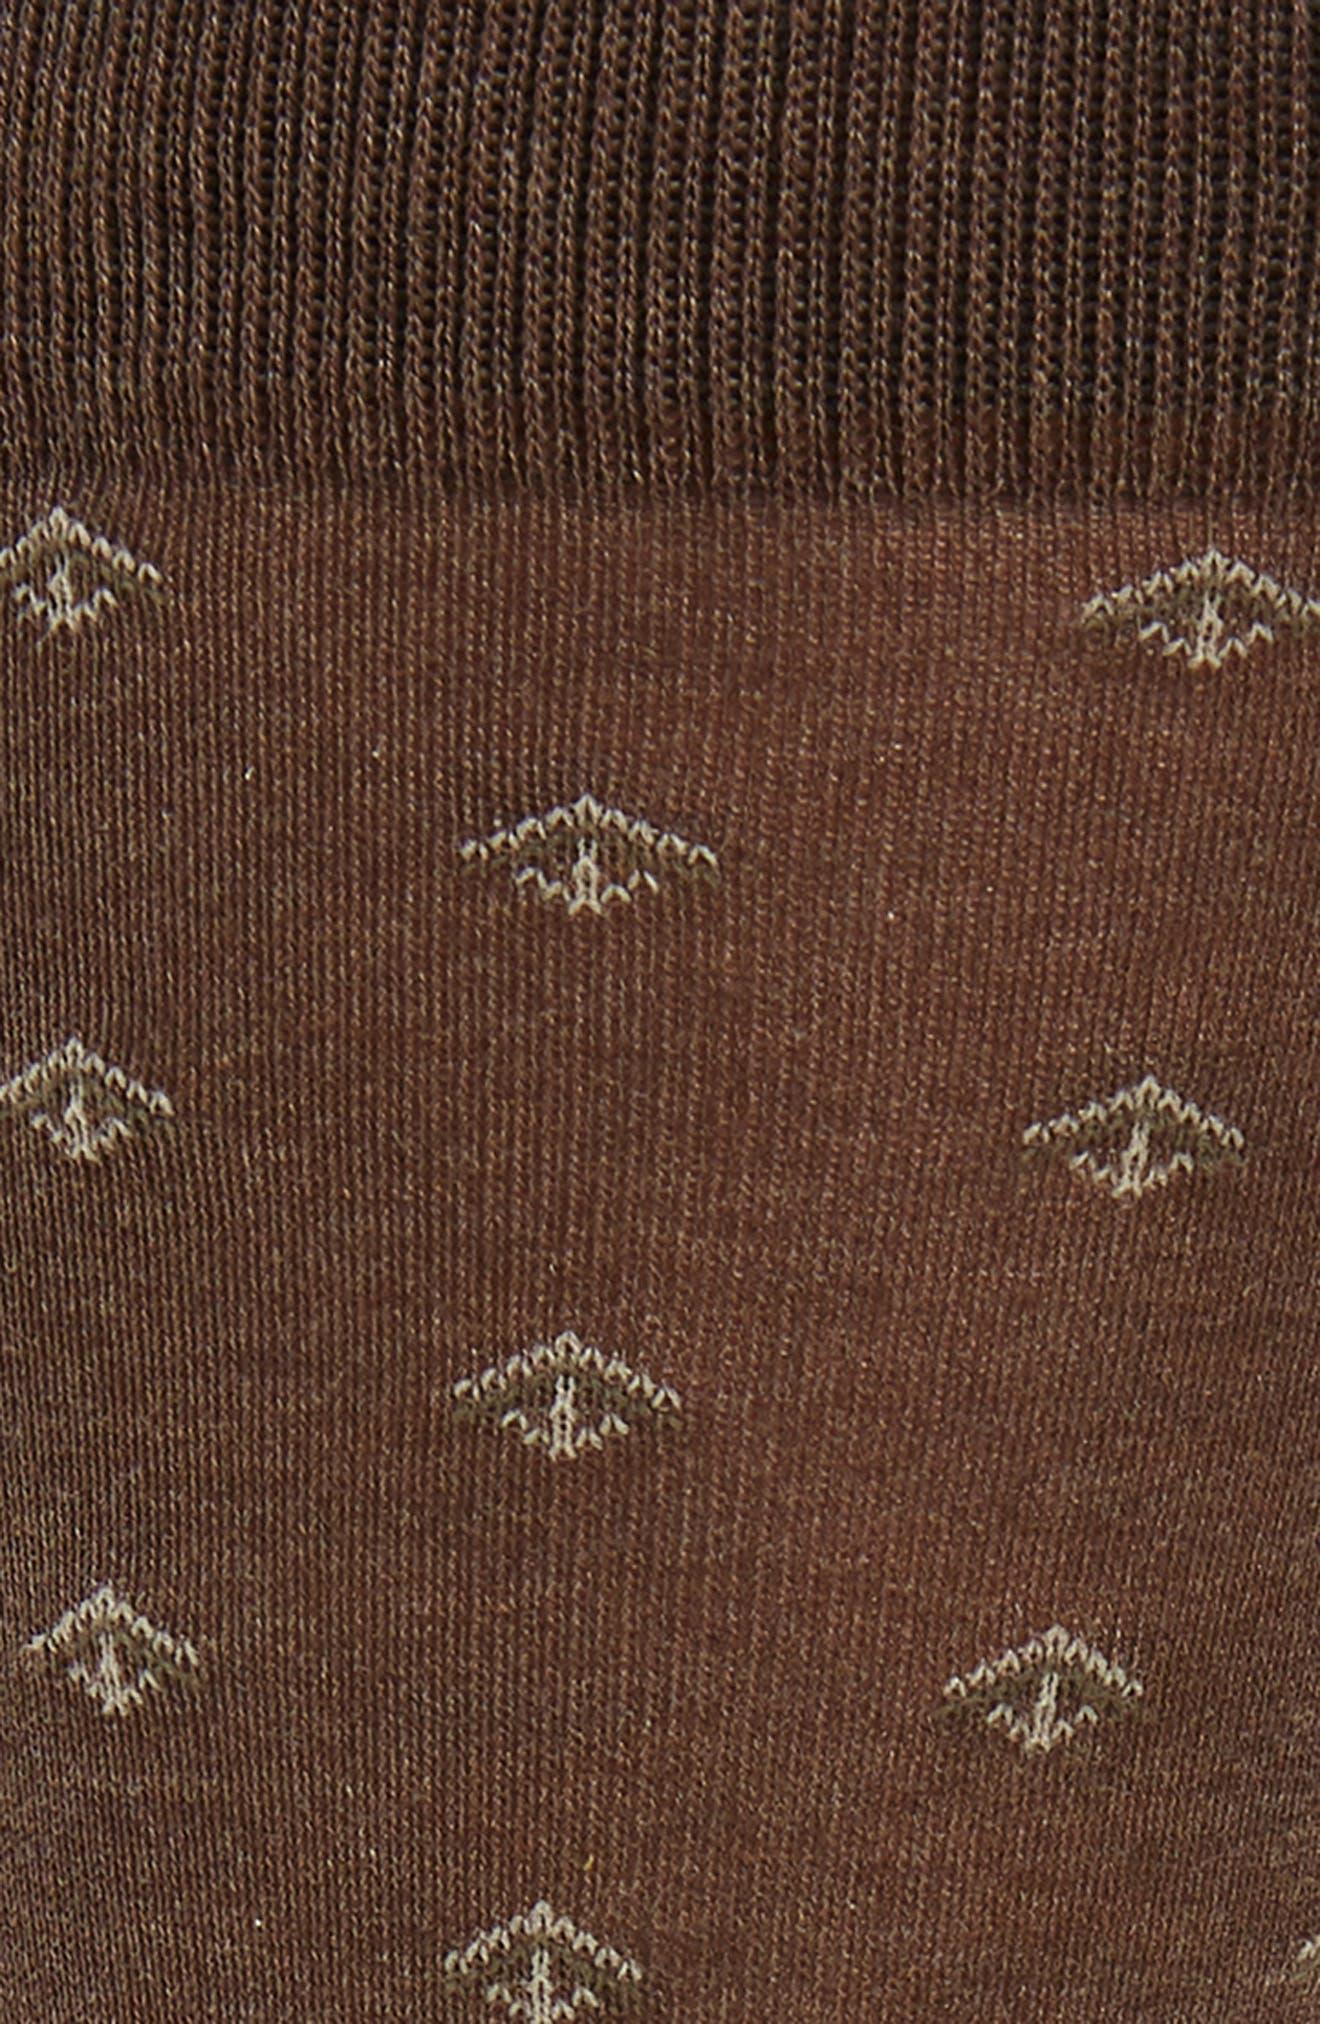 Cascading Arrows Socks,                             Alternate thumbnail 2, color,                             230